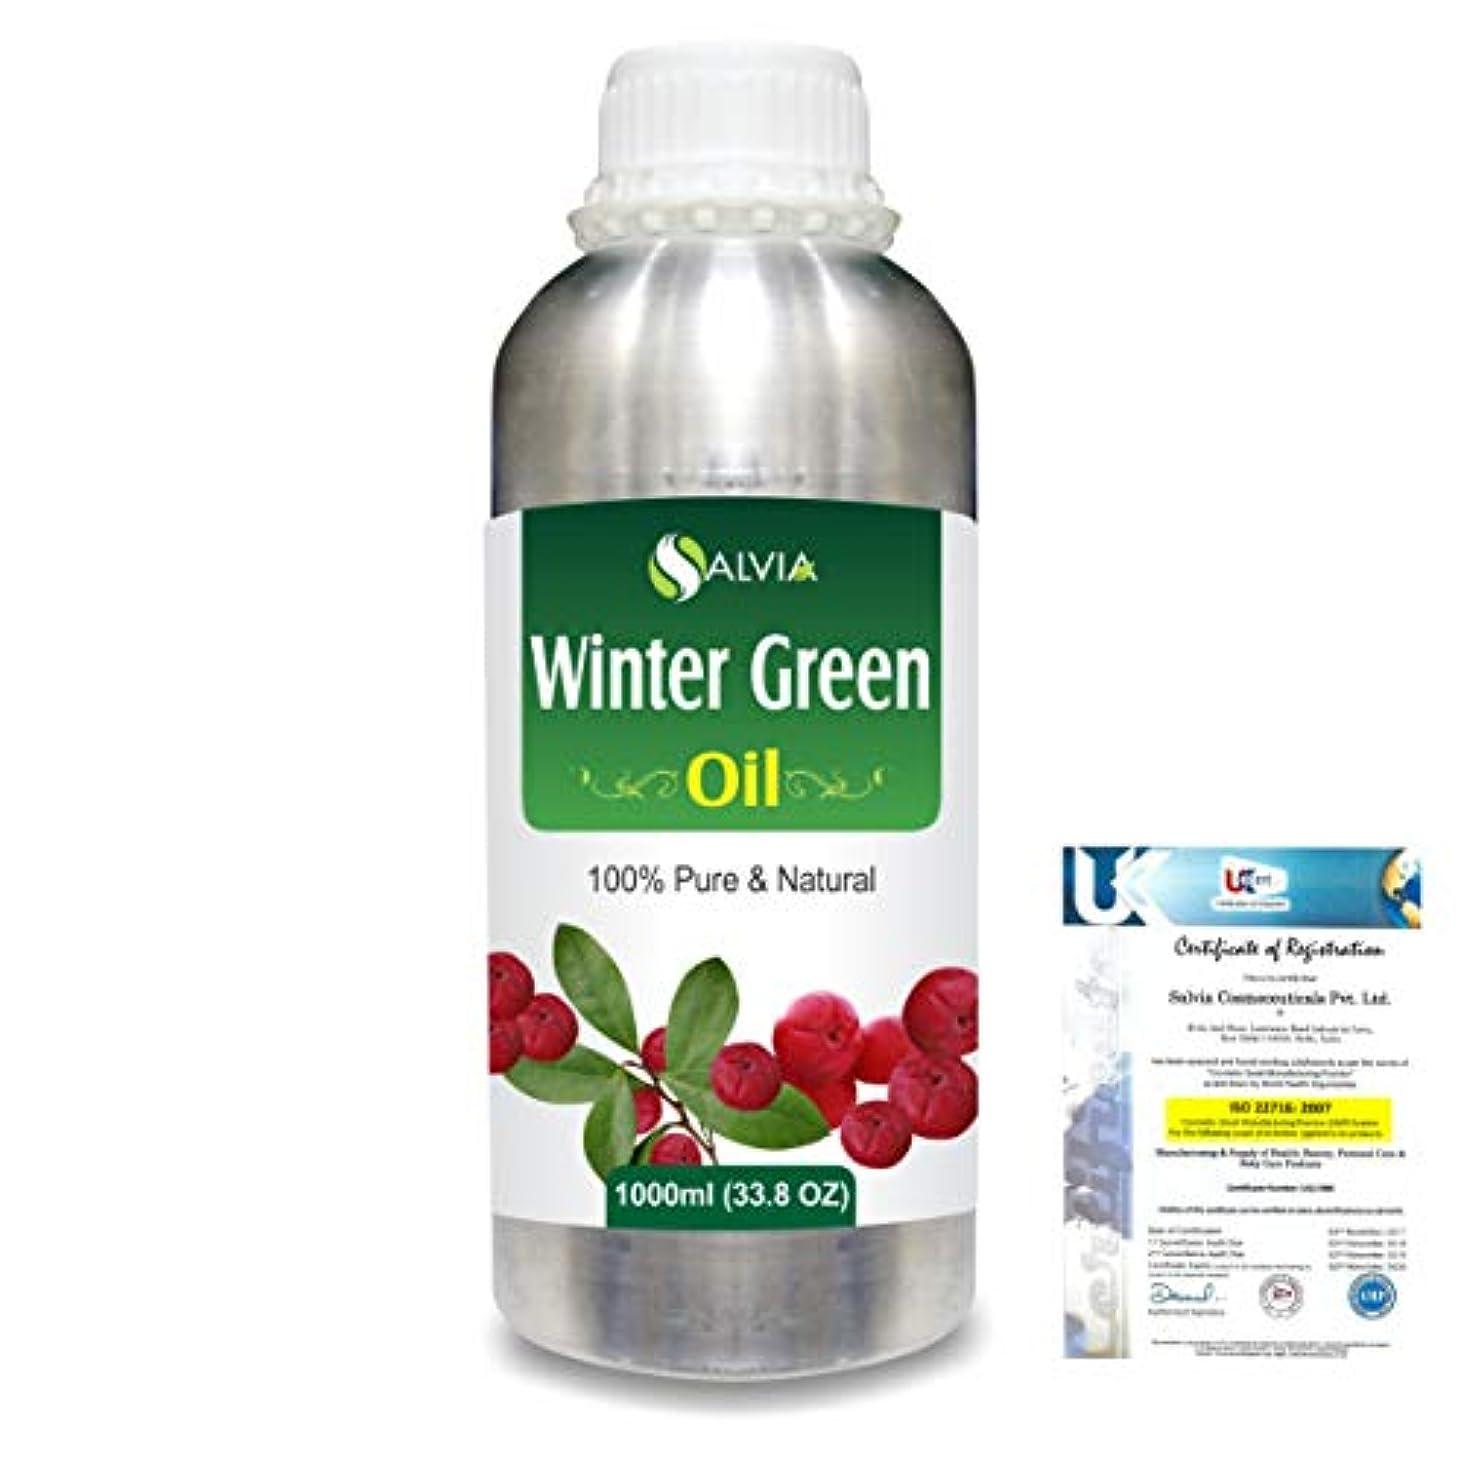 物理学者情緒的地震Winter Green(Gaultheria Procumbens) 100% Natural Pure Essential Oil 1000ml/33.8fl.oz.